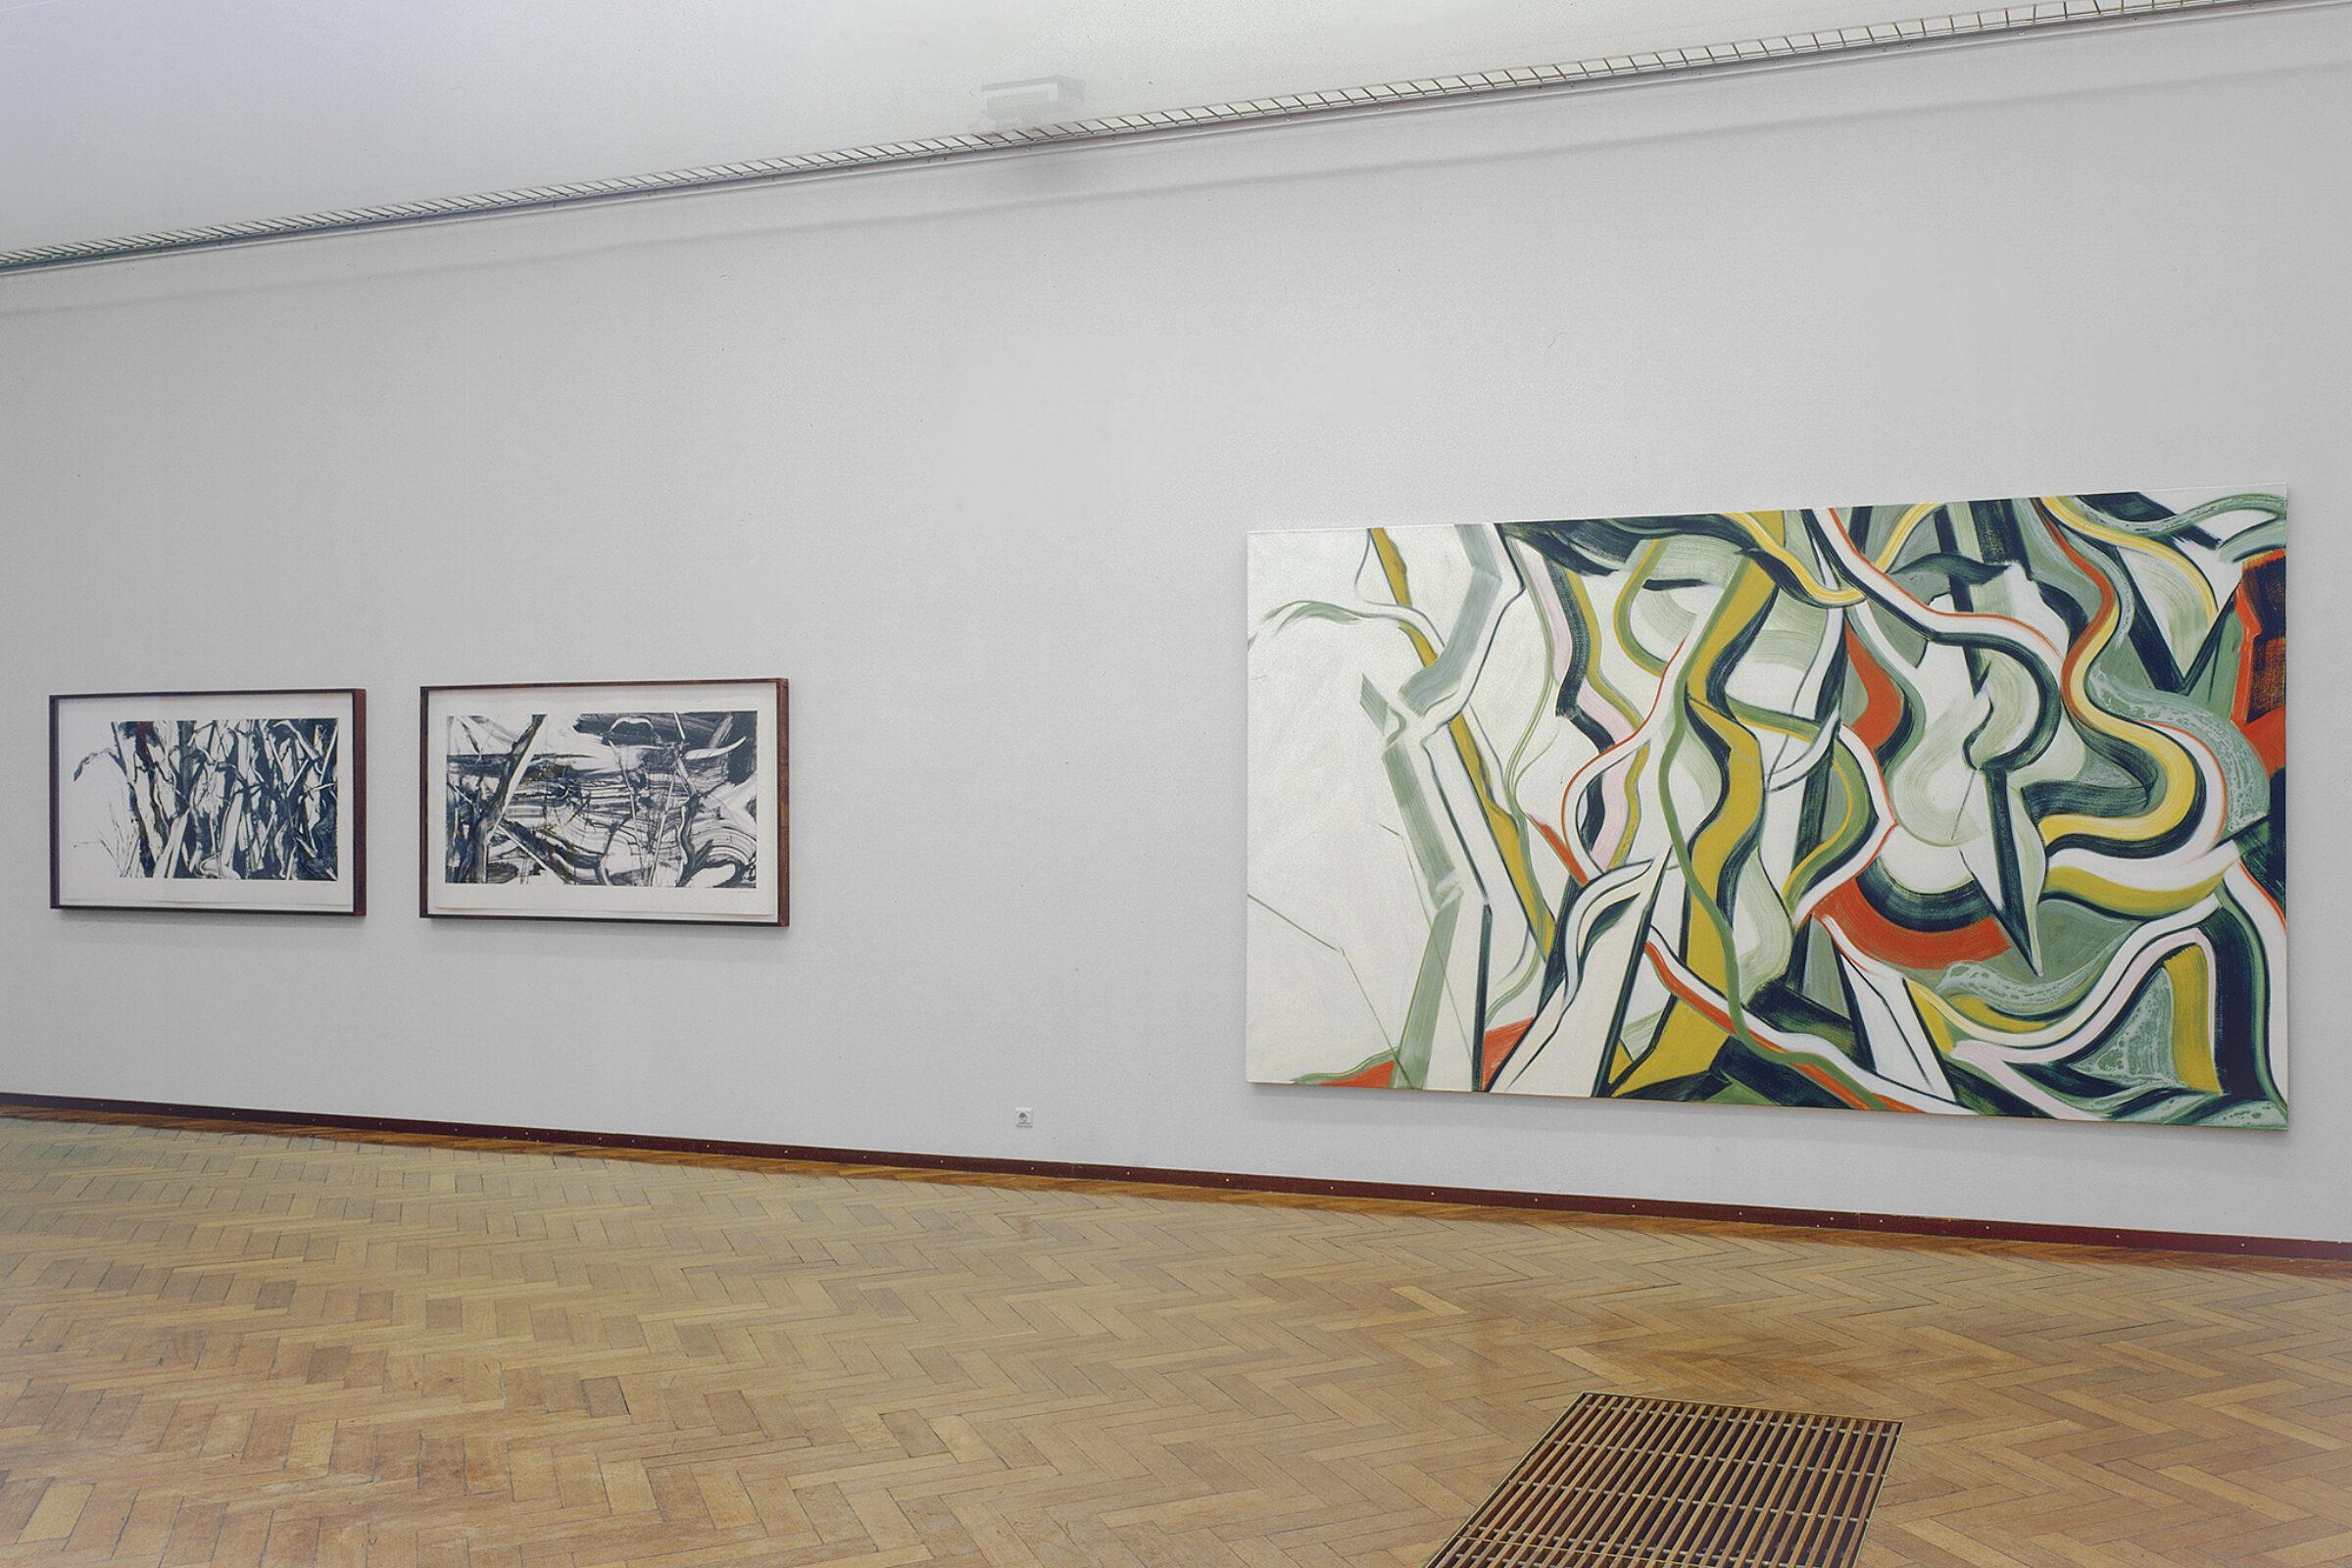 Robert-Zandvliet-Galerie-Onrust-EX-stedelijk02.jpg